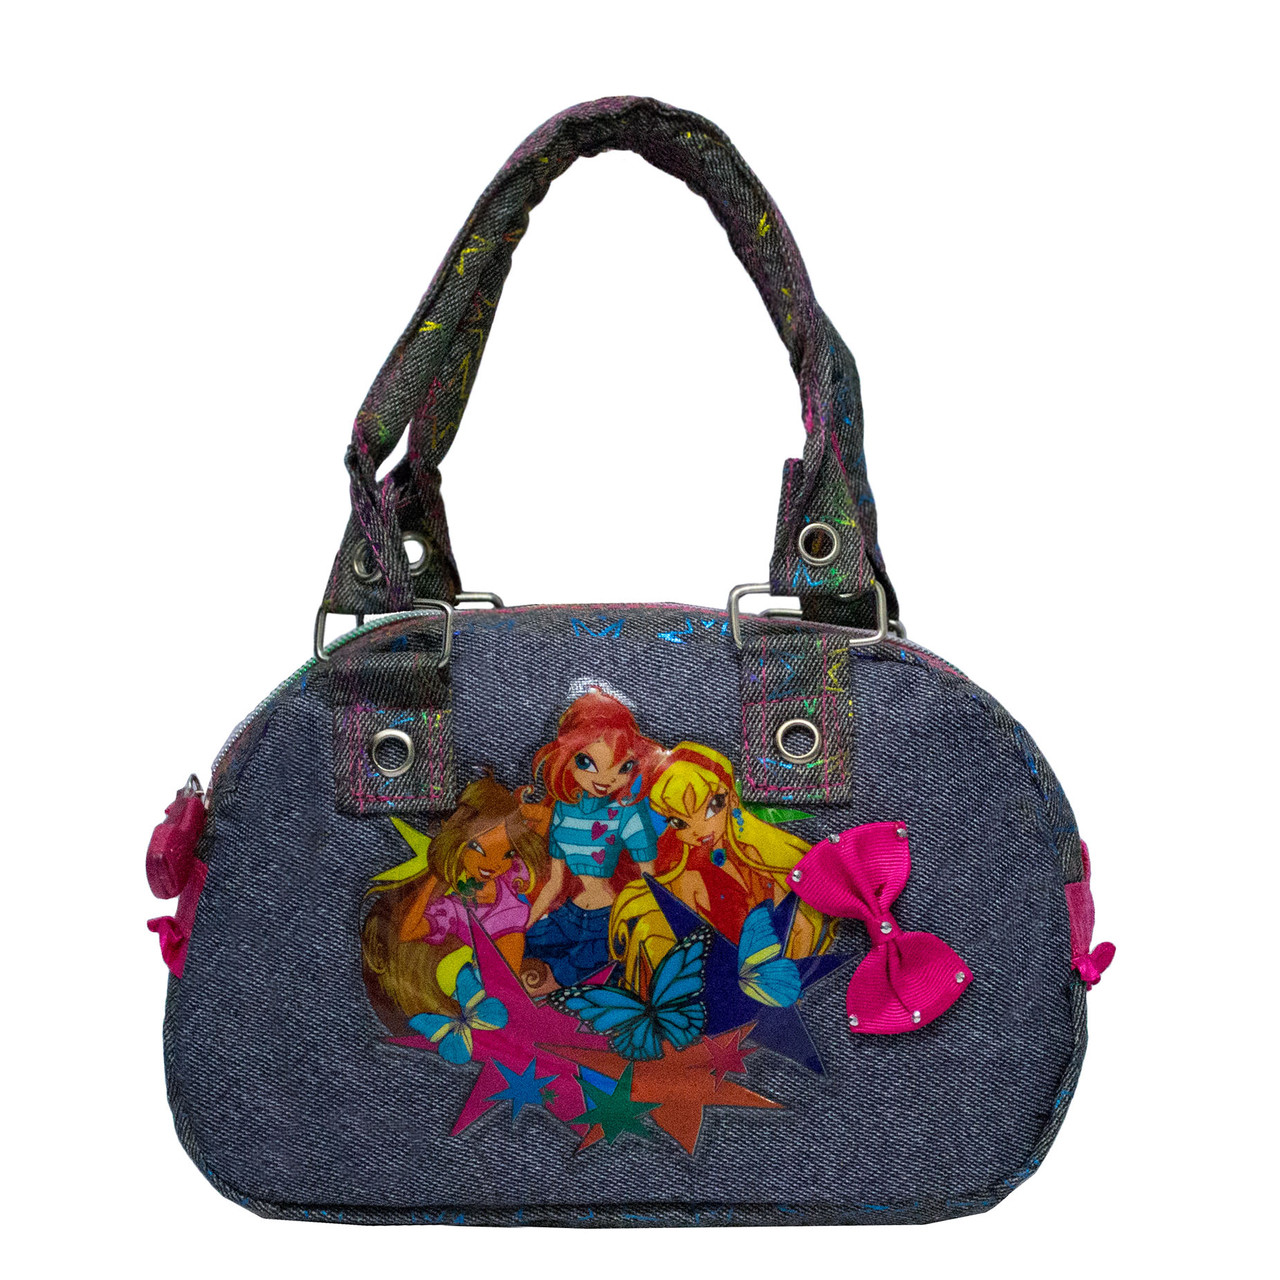 00511d5a39b0 Детская сумка «Школа волшебства Winx»